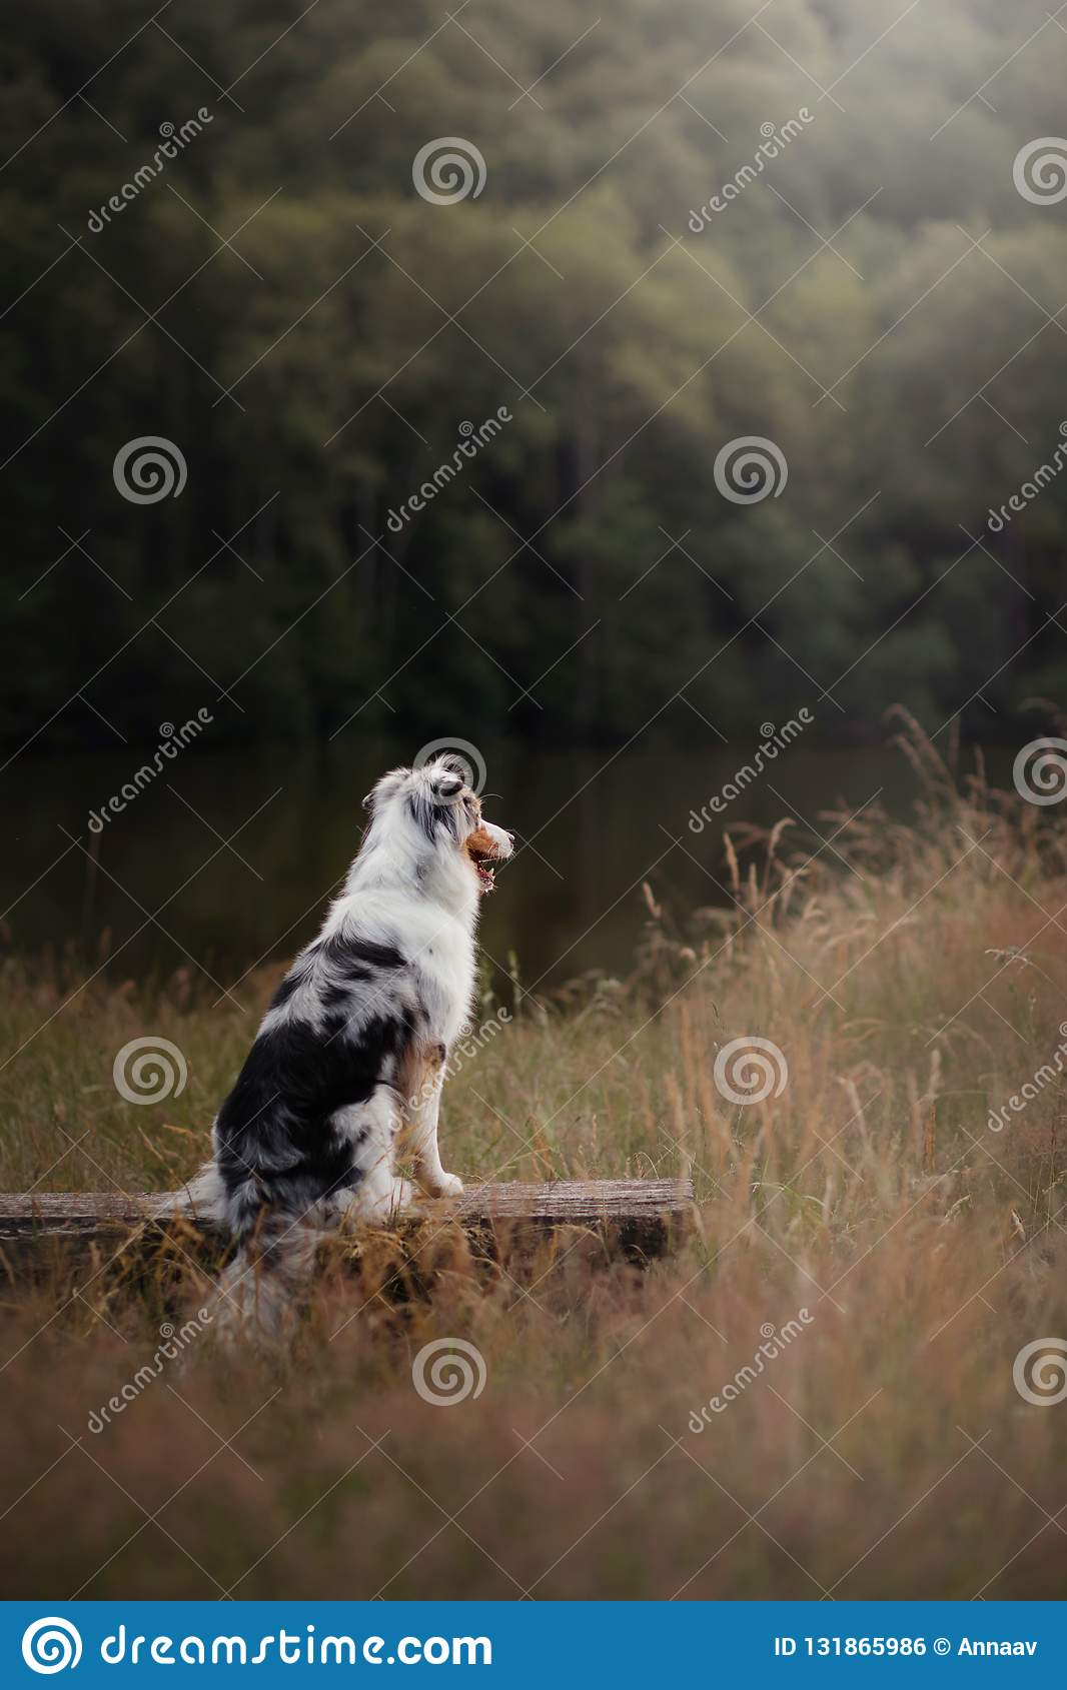 Dog Australian Shepherd sitting on a bench. Pet in nature. Autumn mood